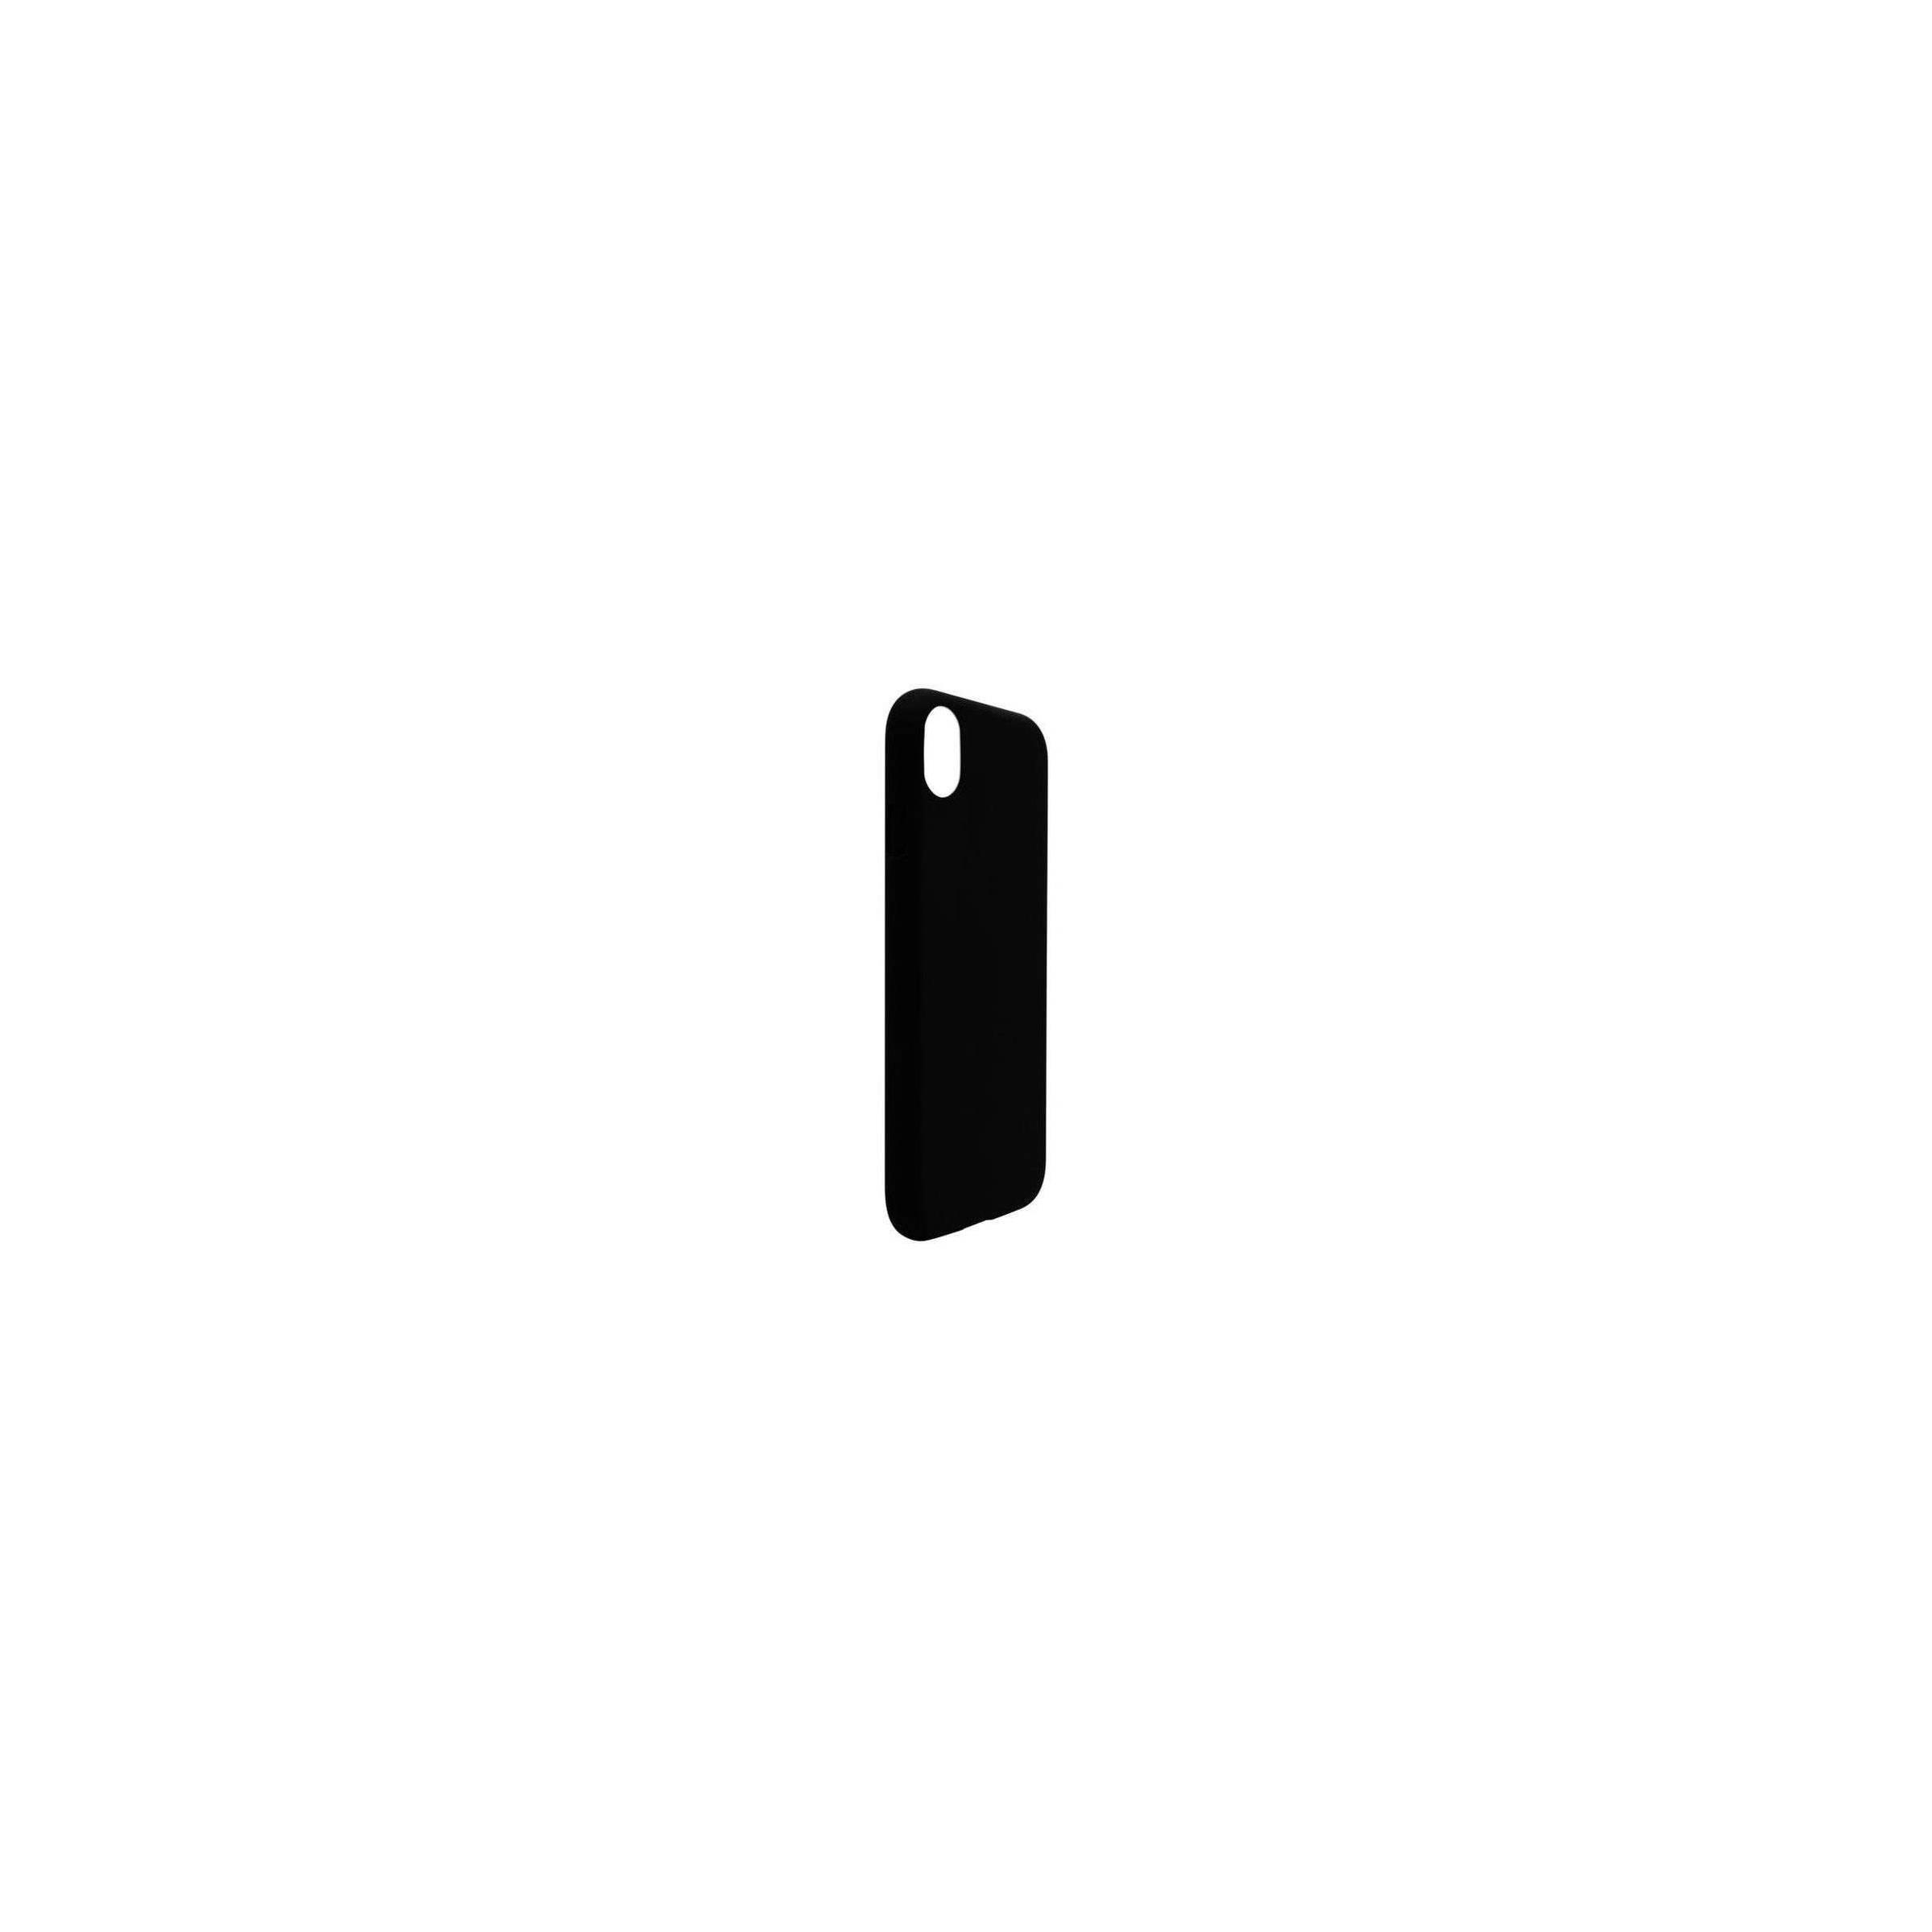 aiino Aiino strongly premium cover til iphone x / xs farve sort fra mackabler.dk